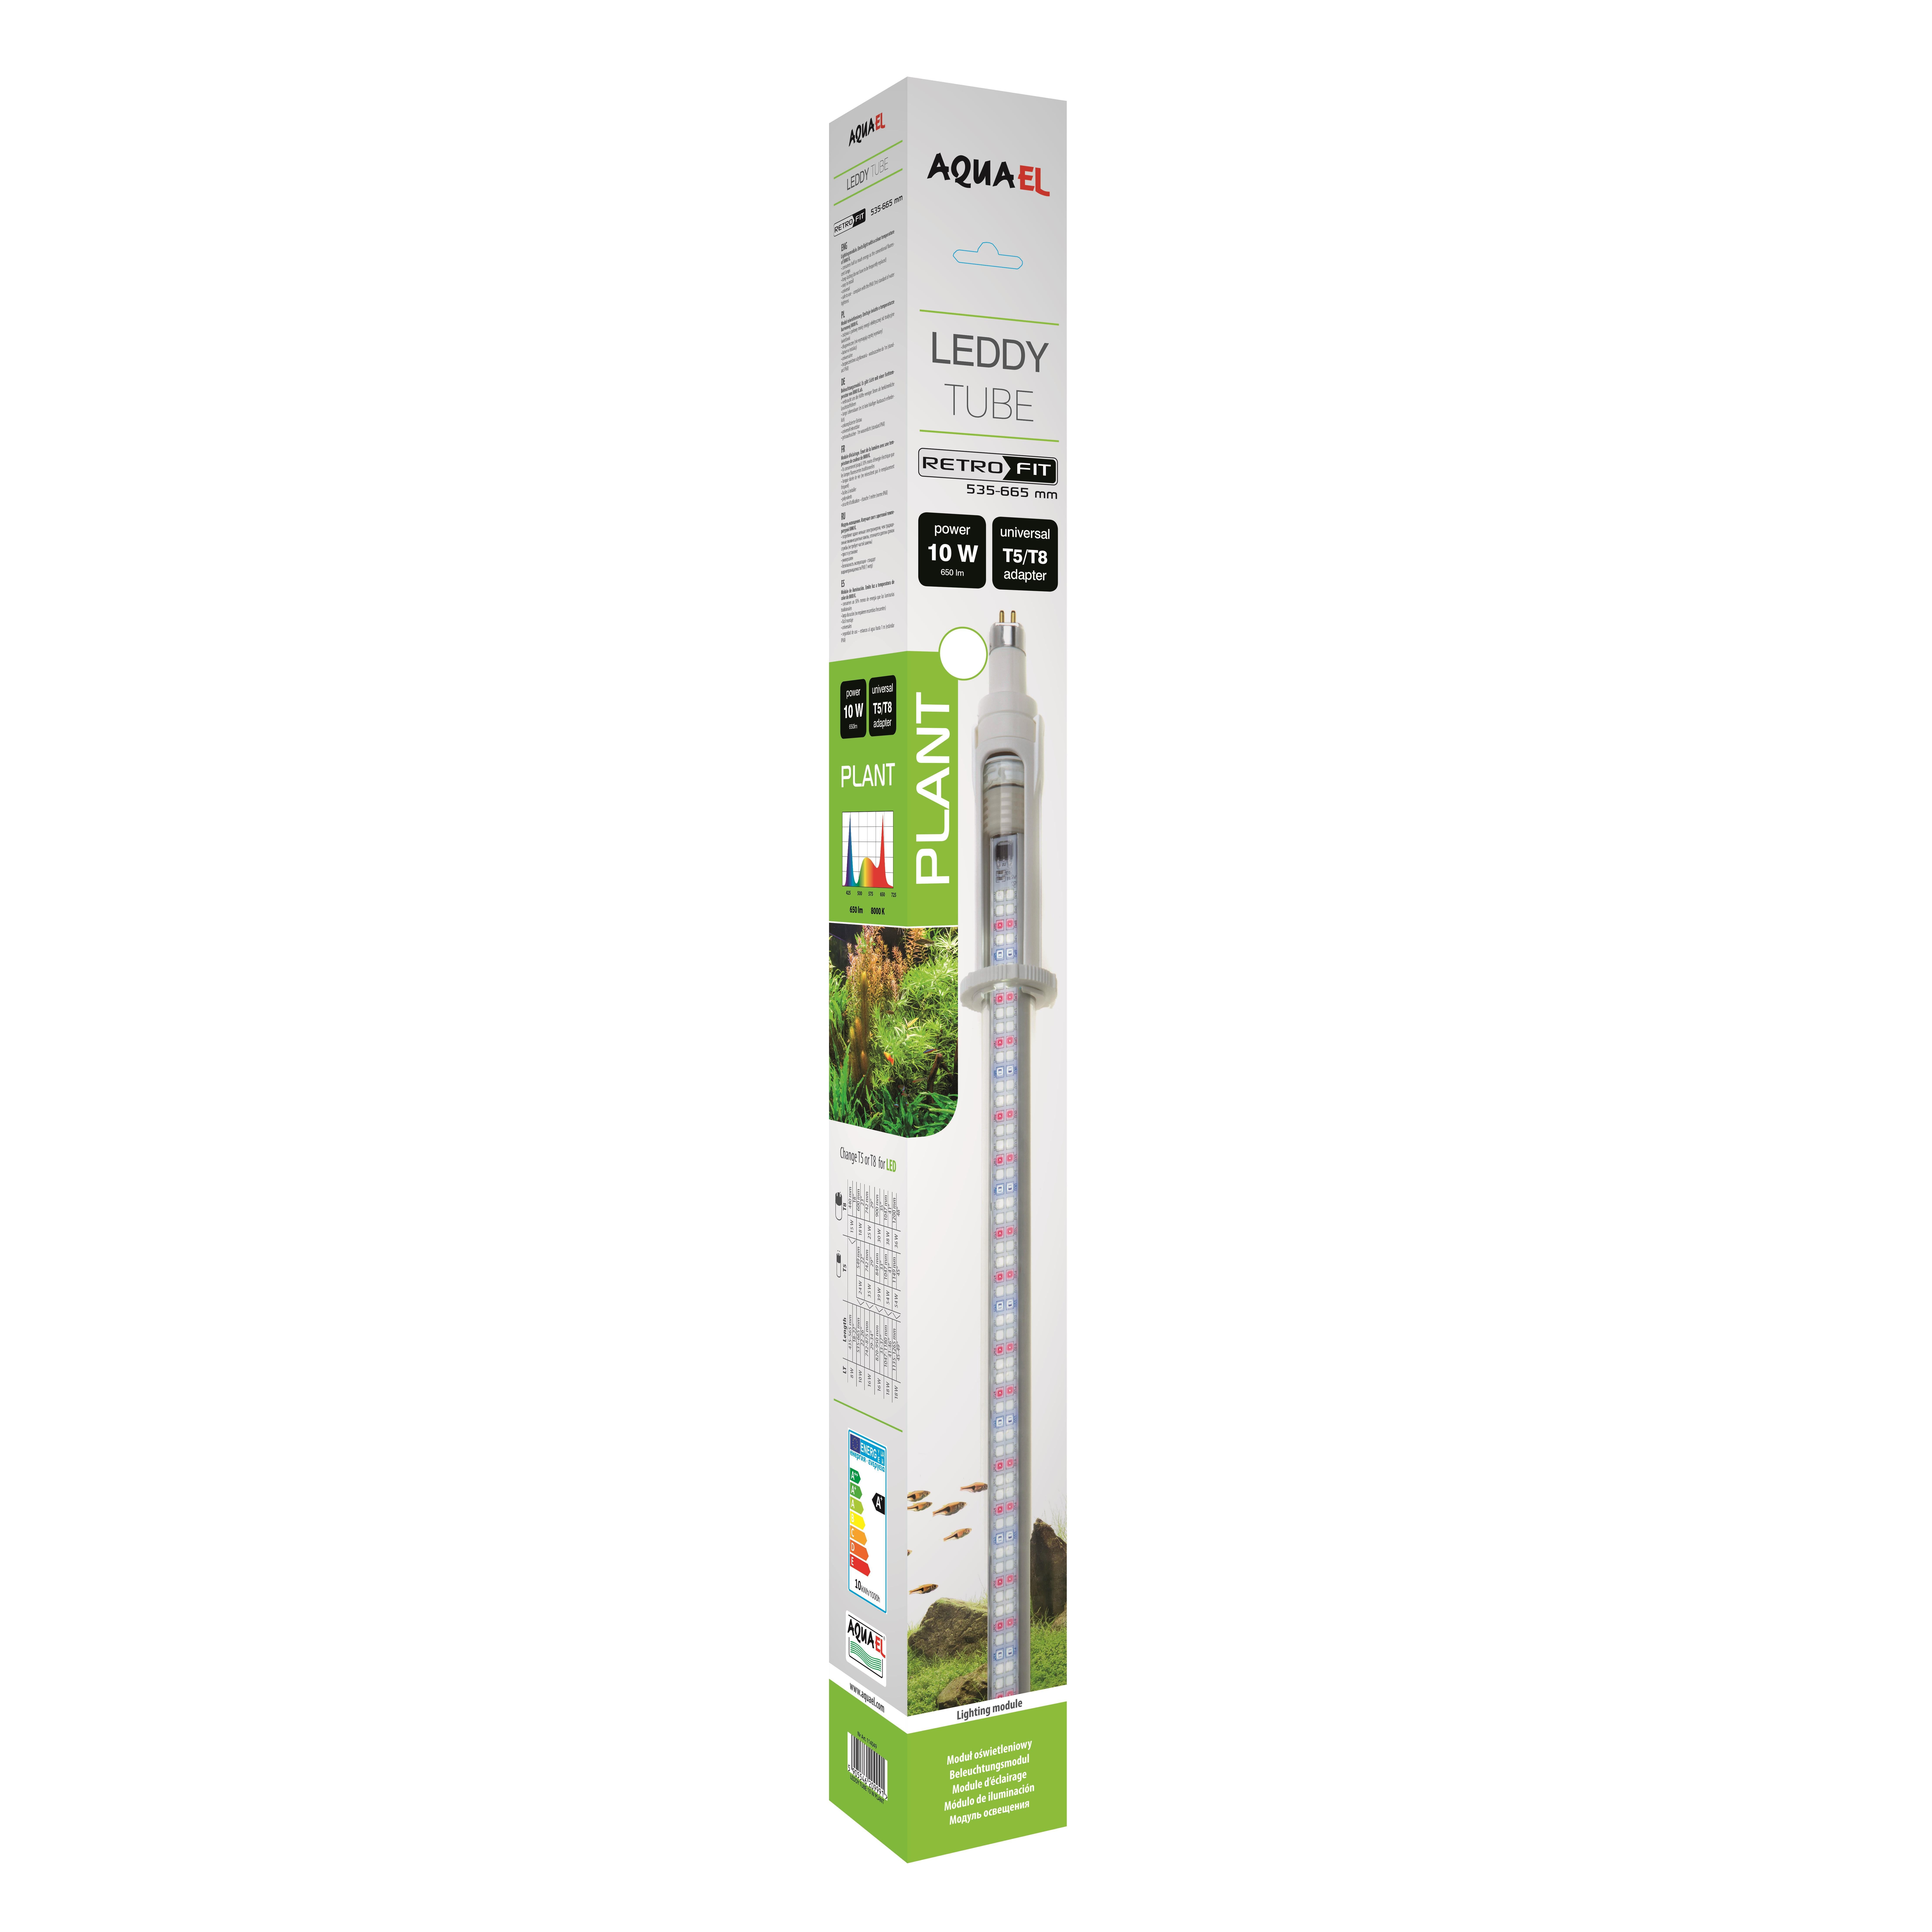 Aquael Lysrör LED Universal Plant 10W 535-665mm